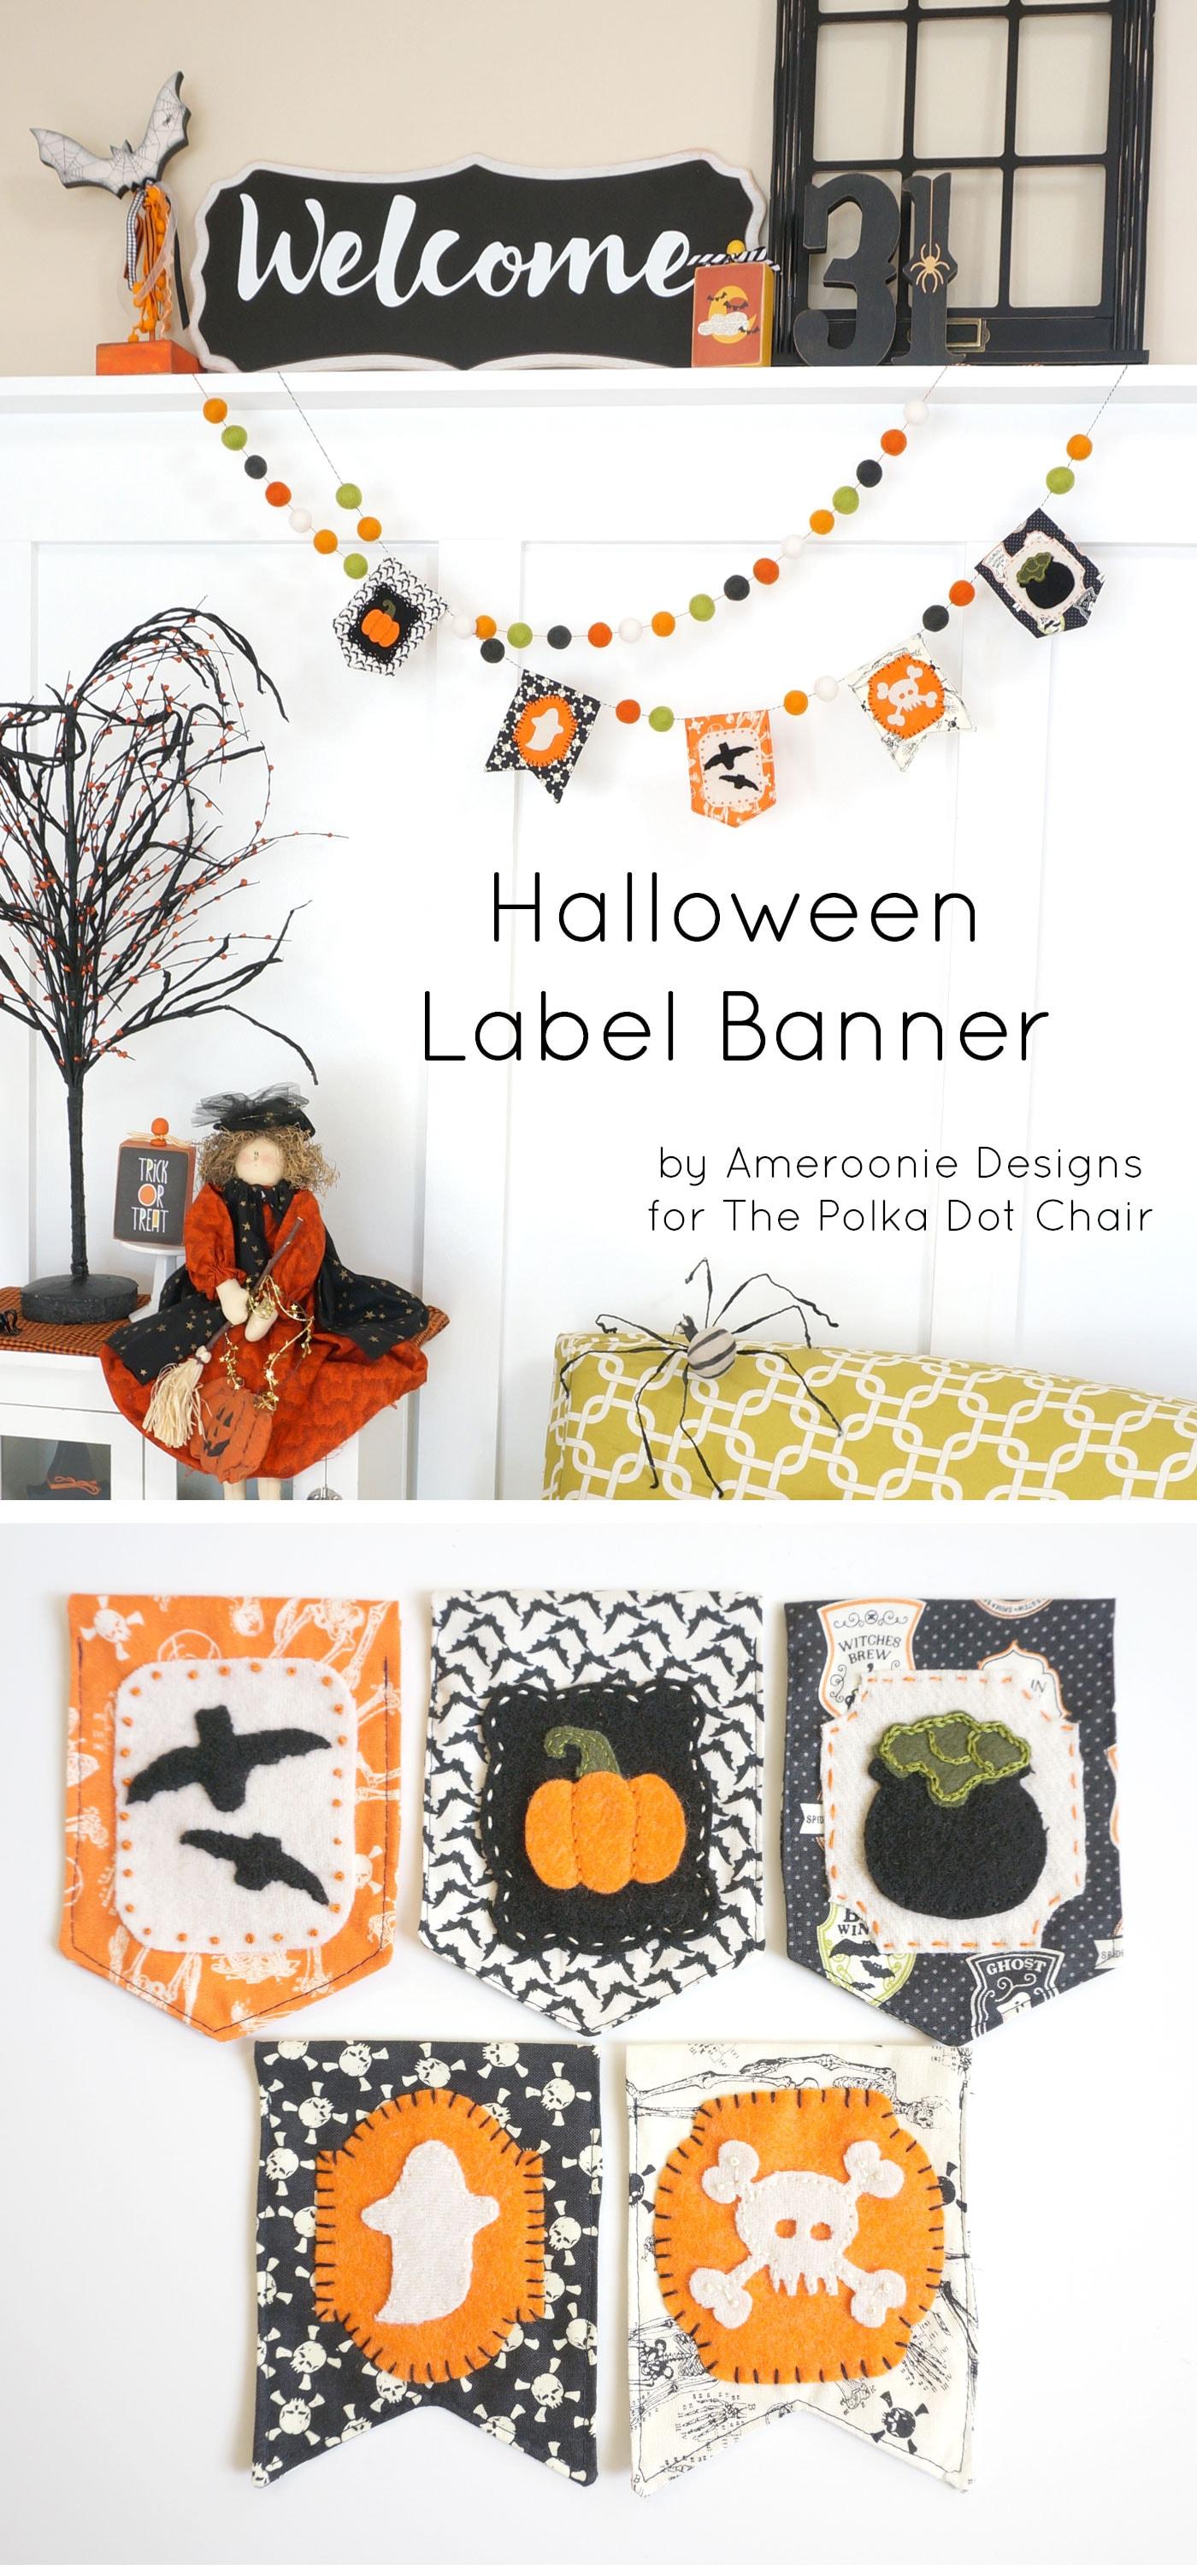 DIY Fabric Halloween Banner tutorial - with free applique pattern! #halloween #halloweensewing #halloweenbanner #sewing #sewingproject #halloweensewing #halloweencrafts #halloweenpatterns #embroidery #applique #freepatterns